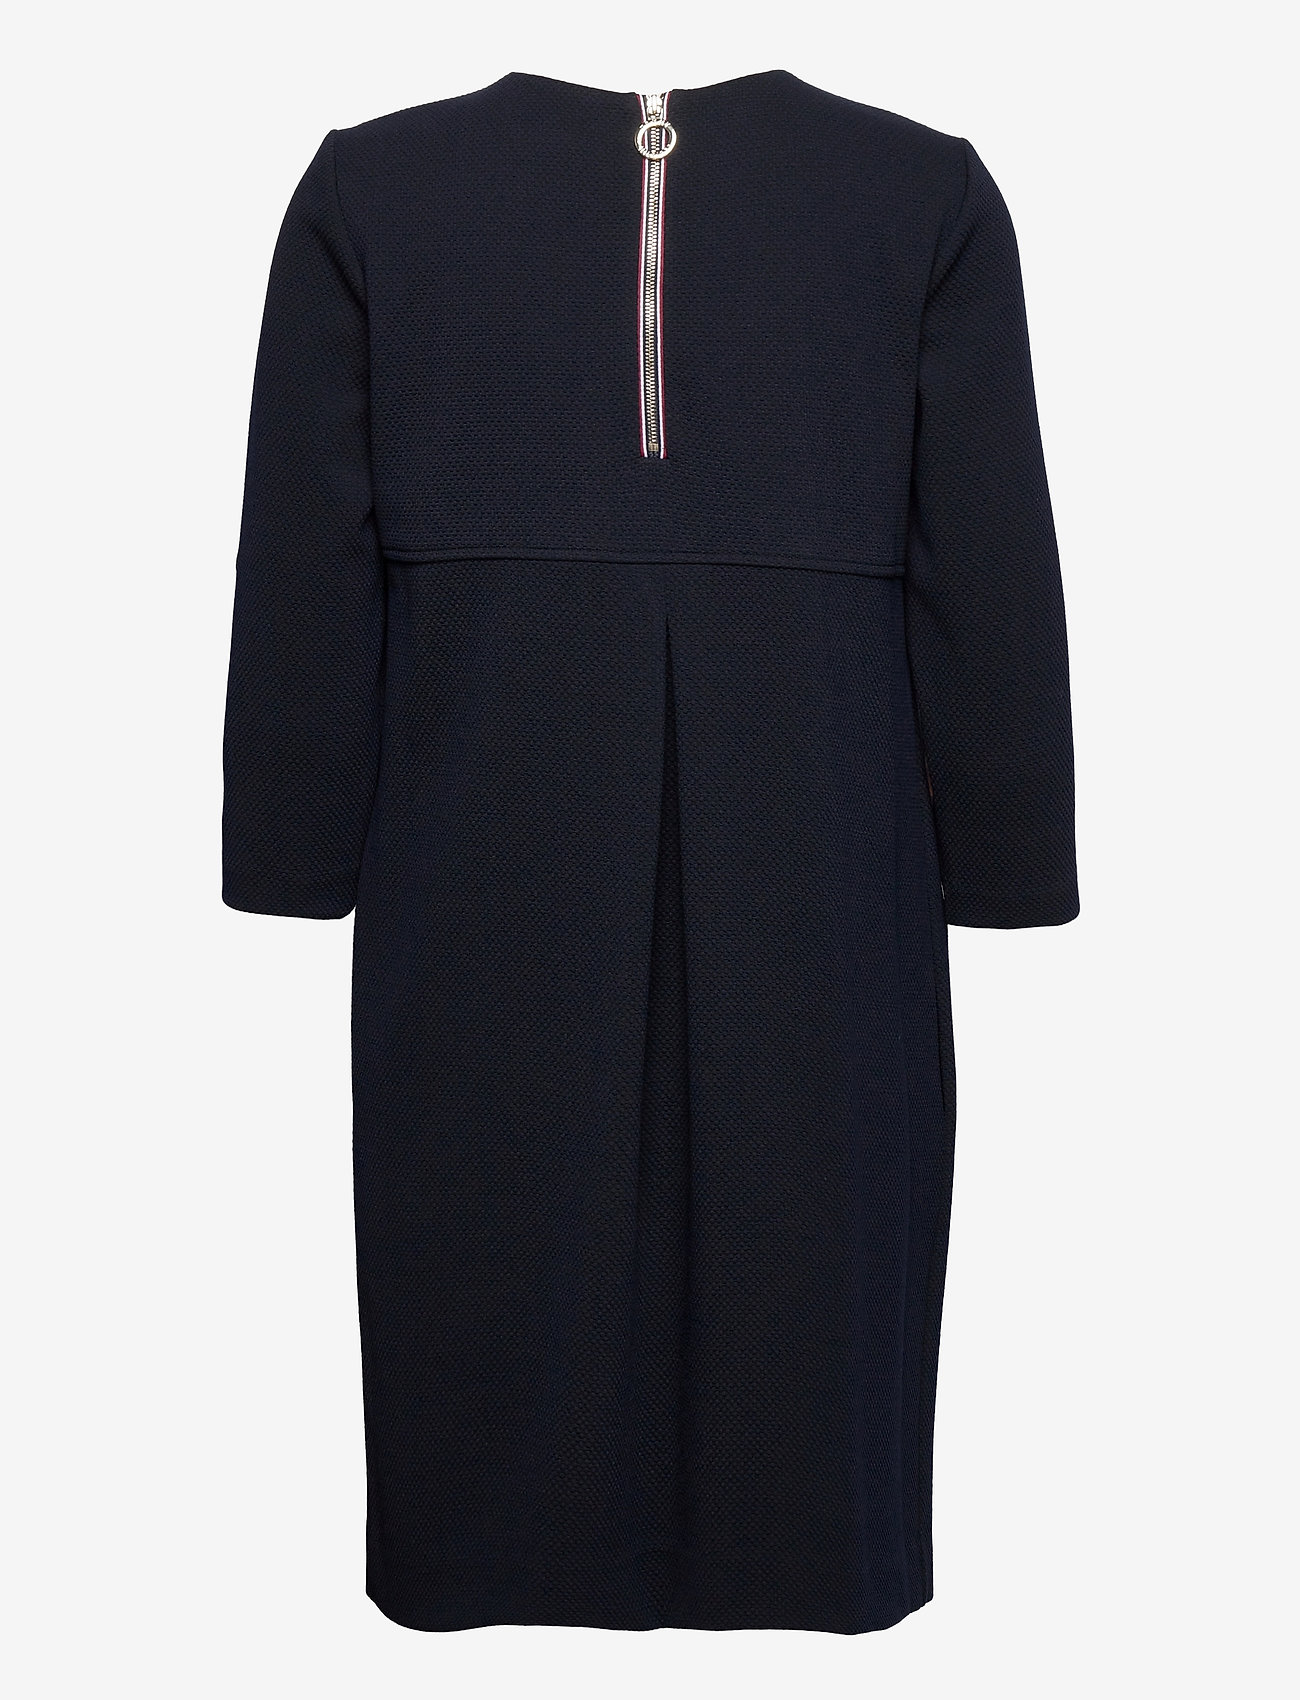 Tommy Hilfiger - SHIFT TEXTURED SS DRESS - midi dresses - desert sky - 1